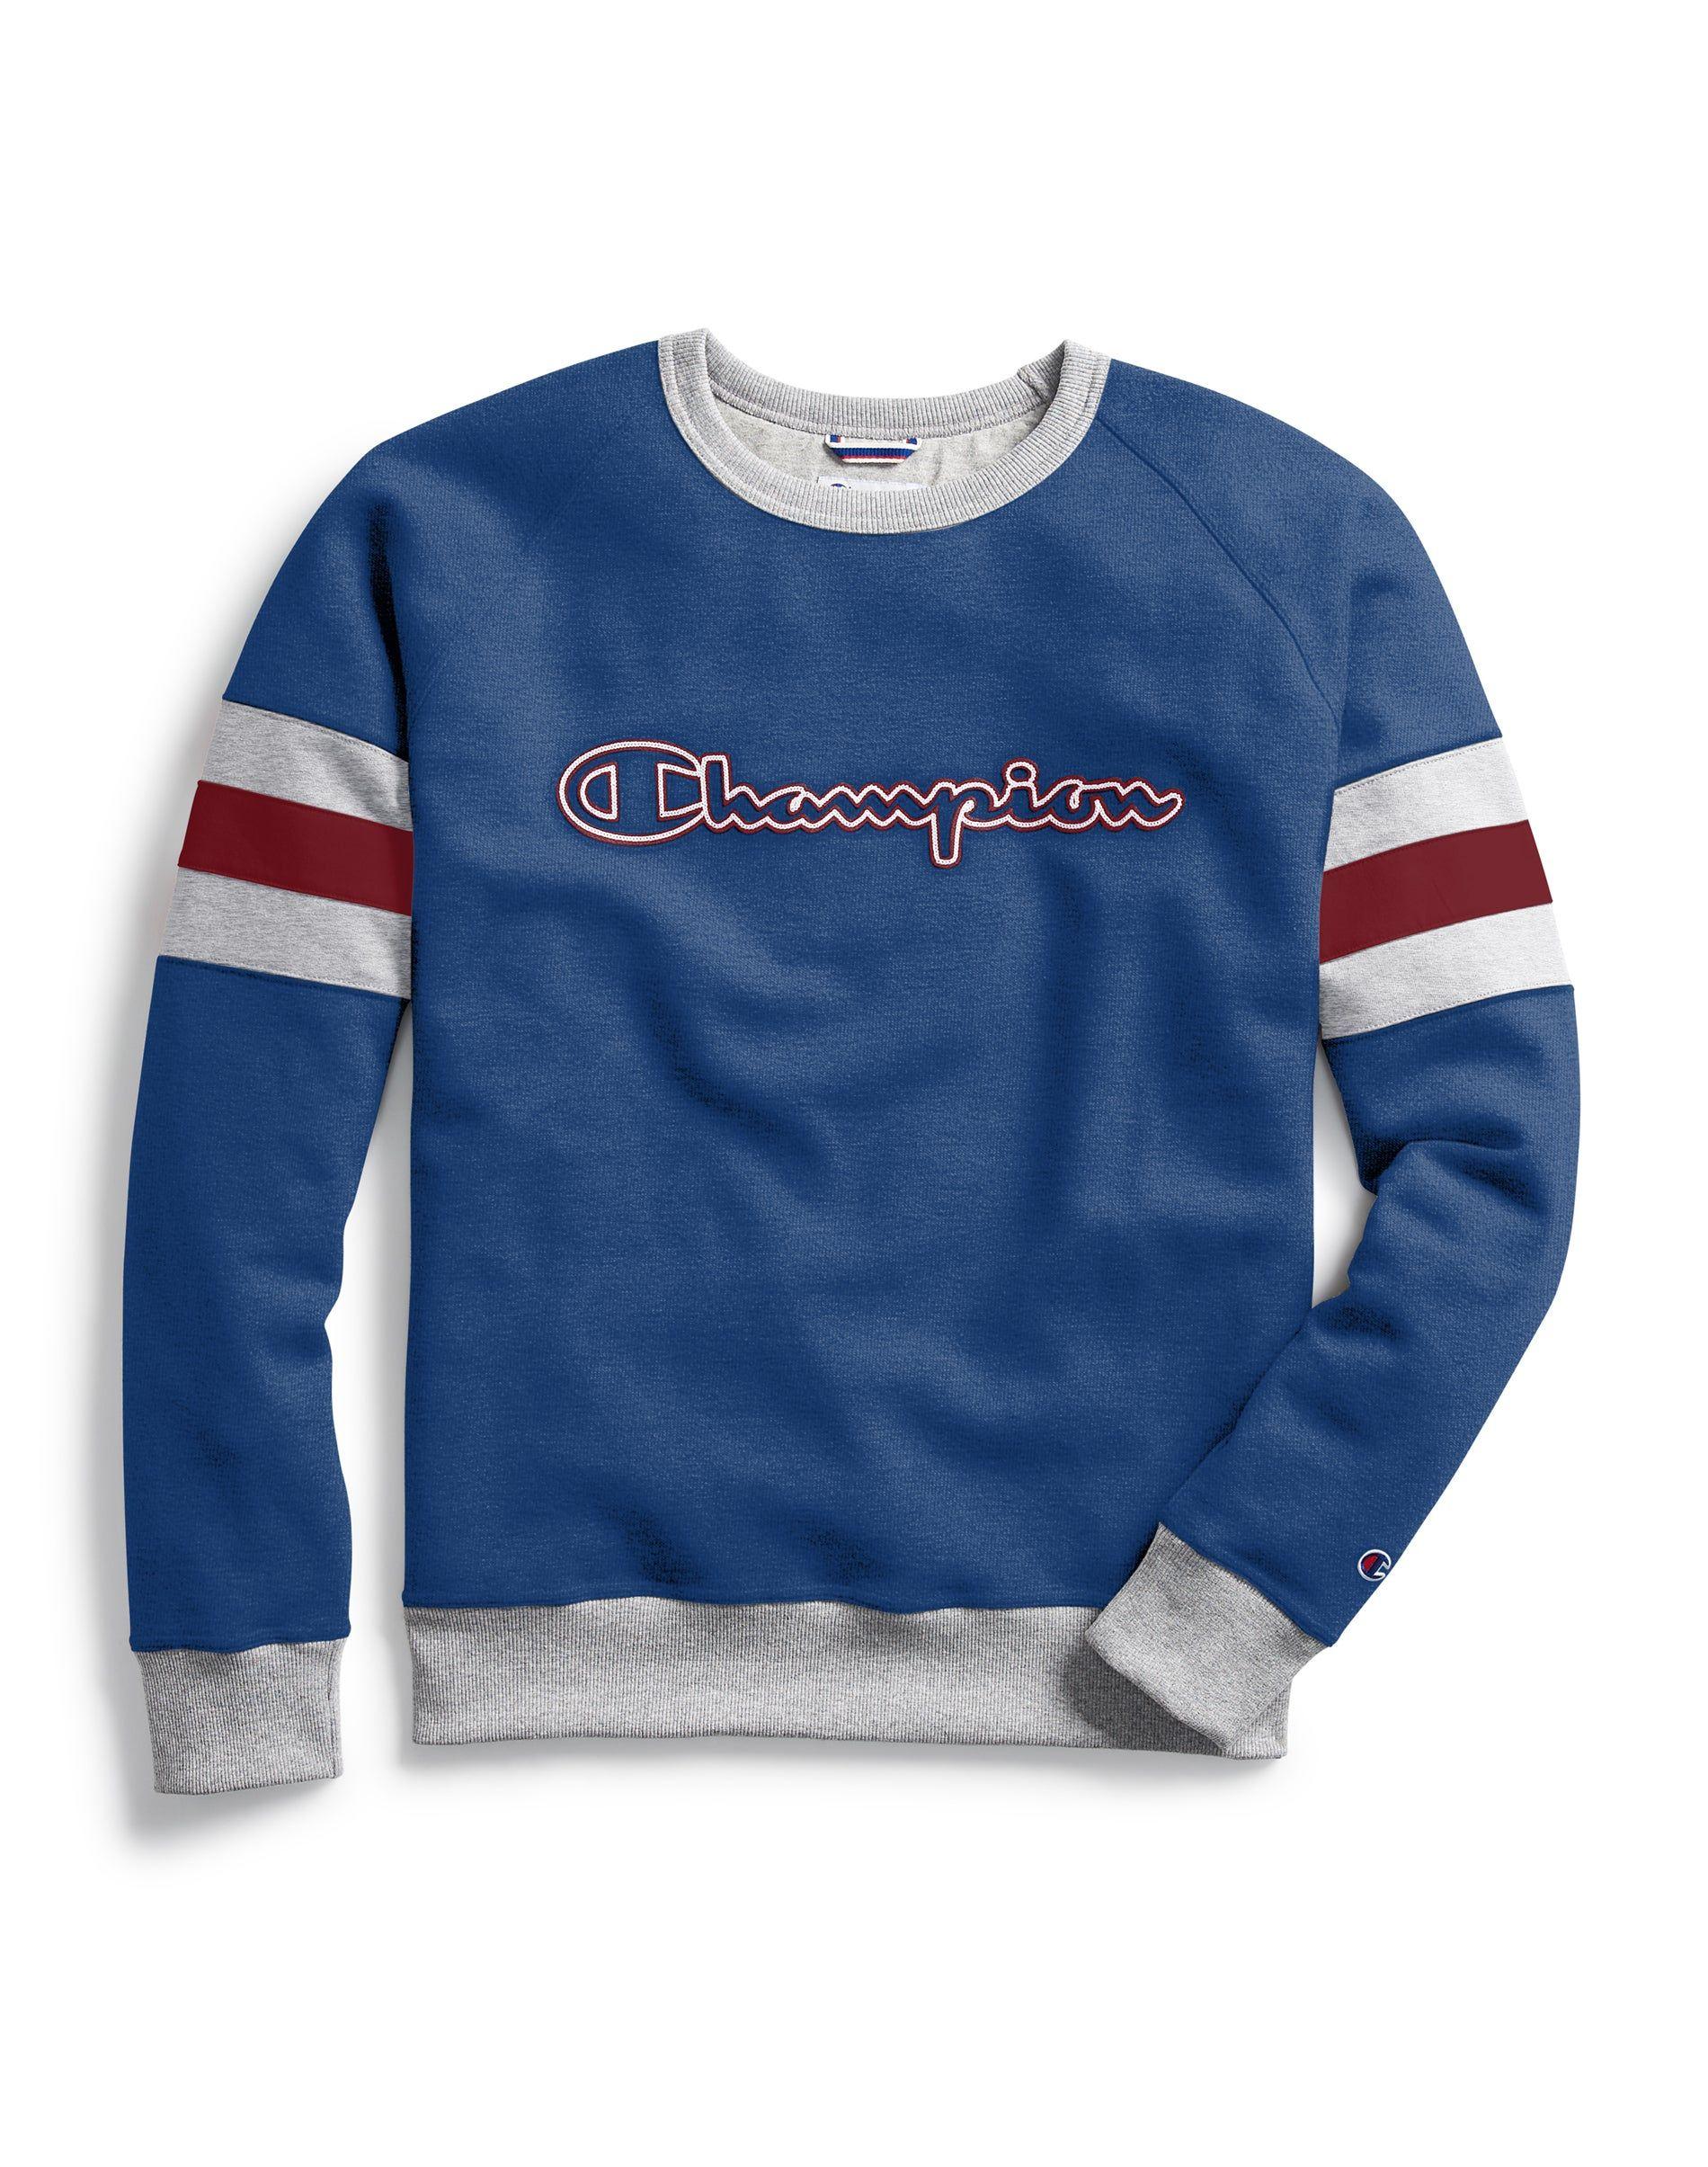 Powerblend Colorblock Crew Outline Logo Sweatshirts Crew Neck Sweatshirt North Face Sweatshirt [ 2410 x 1900 Pixel ]